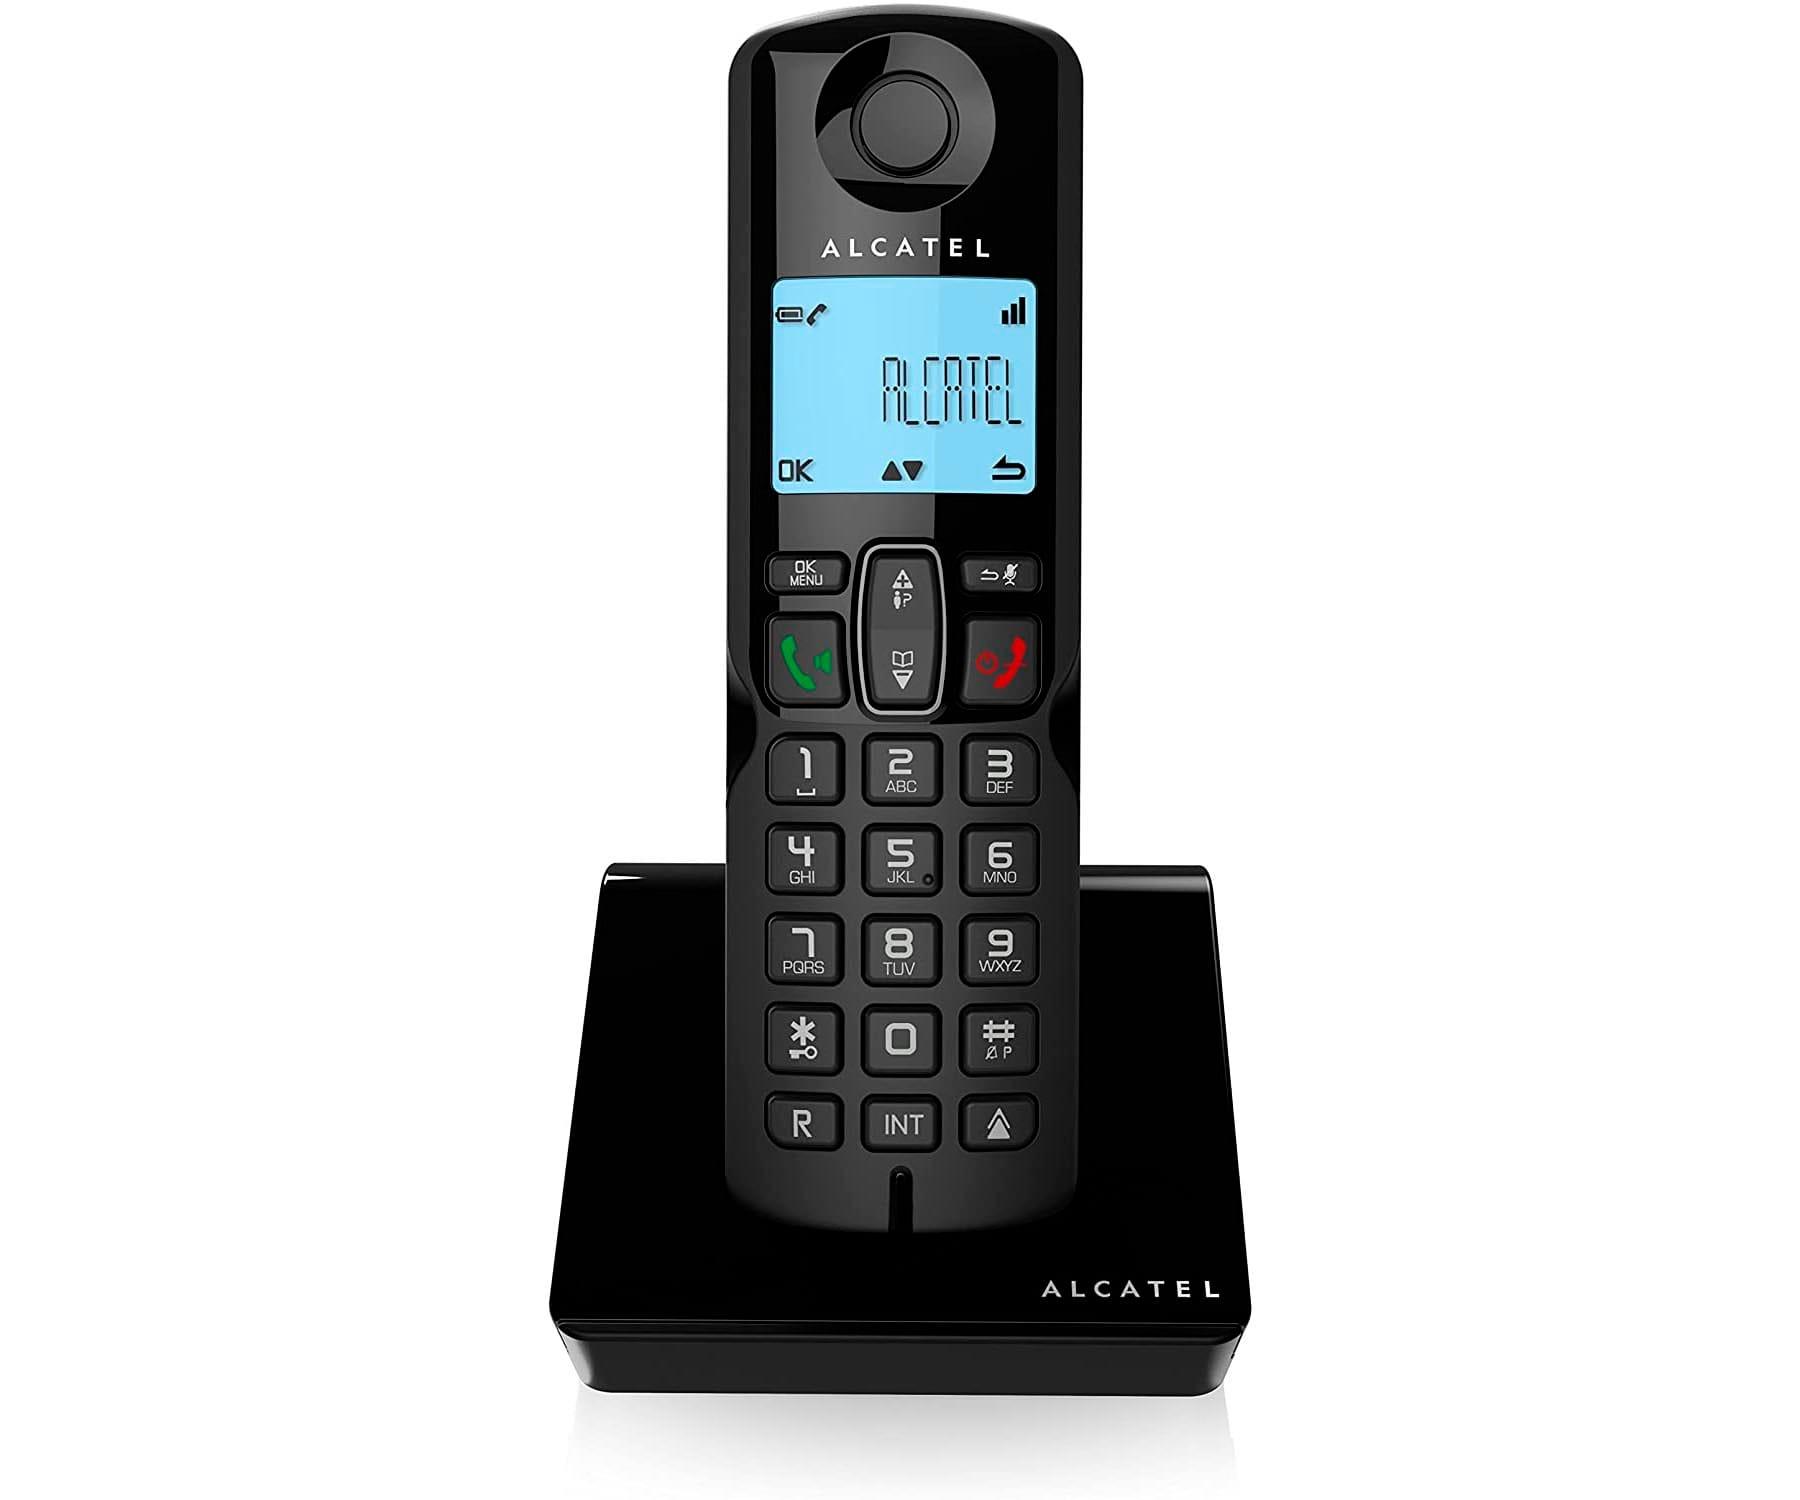 ALCATEL S250 NEGRO TELÉFONO FIJO INALÁMBRICO PANTALLA RETROILUMINADA BLOQUEO DE LLAMADAS